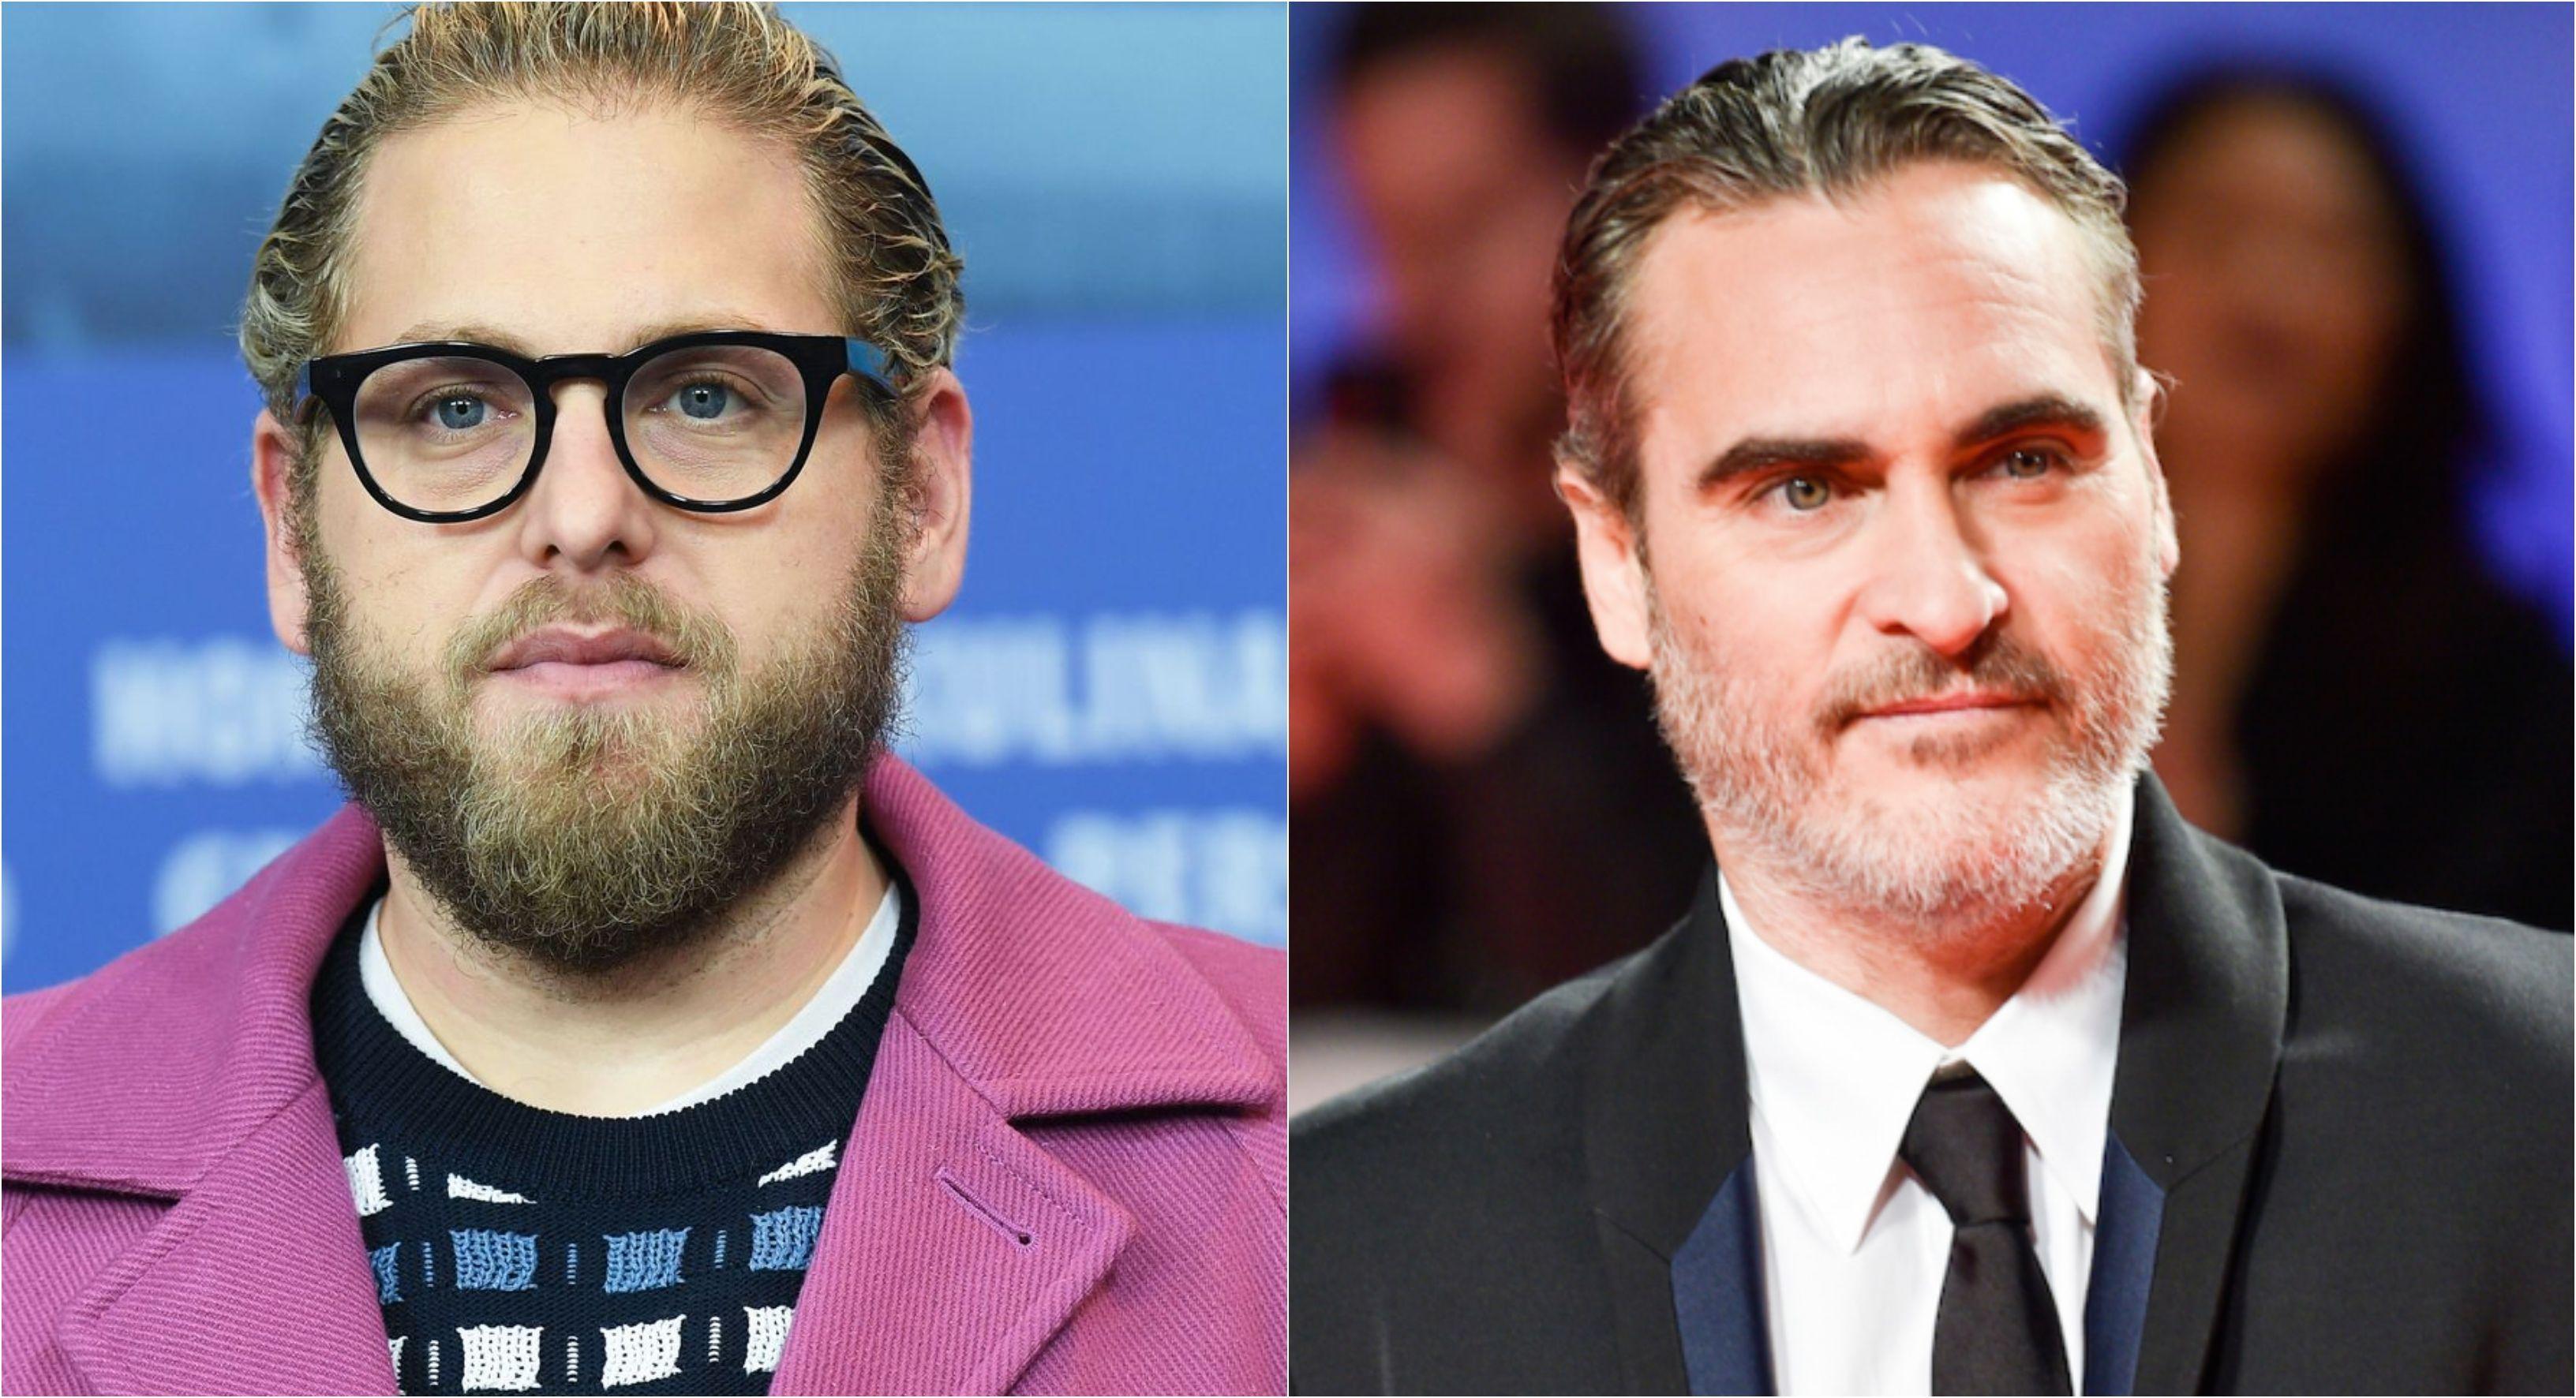 Jonah Hill dirigirá un documental producido por Joaquin Phoenix para Netflix